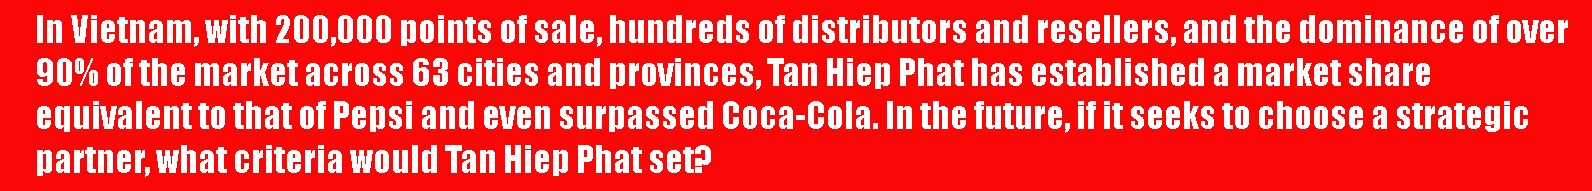 tan hiep phat pushing to expand global reach